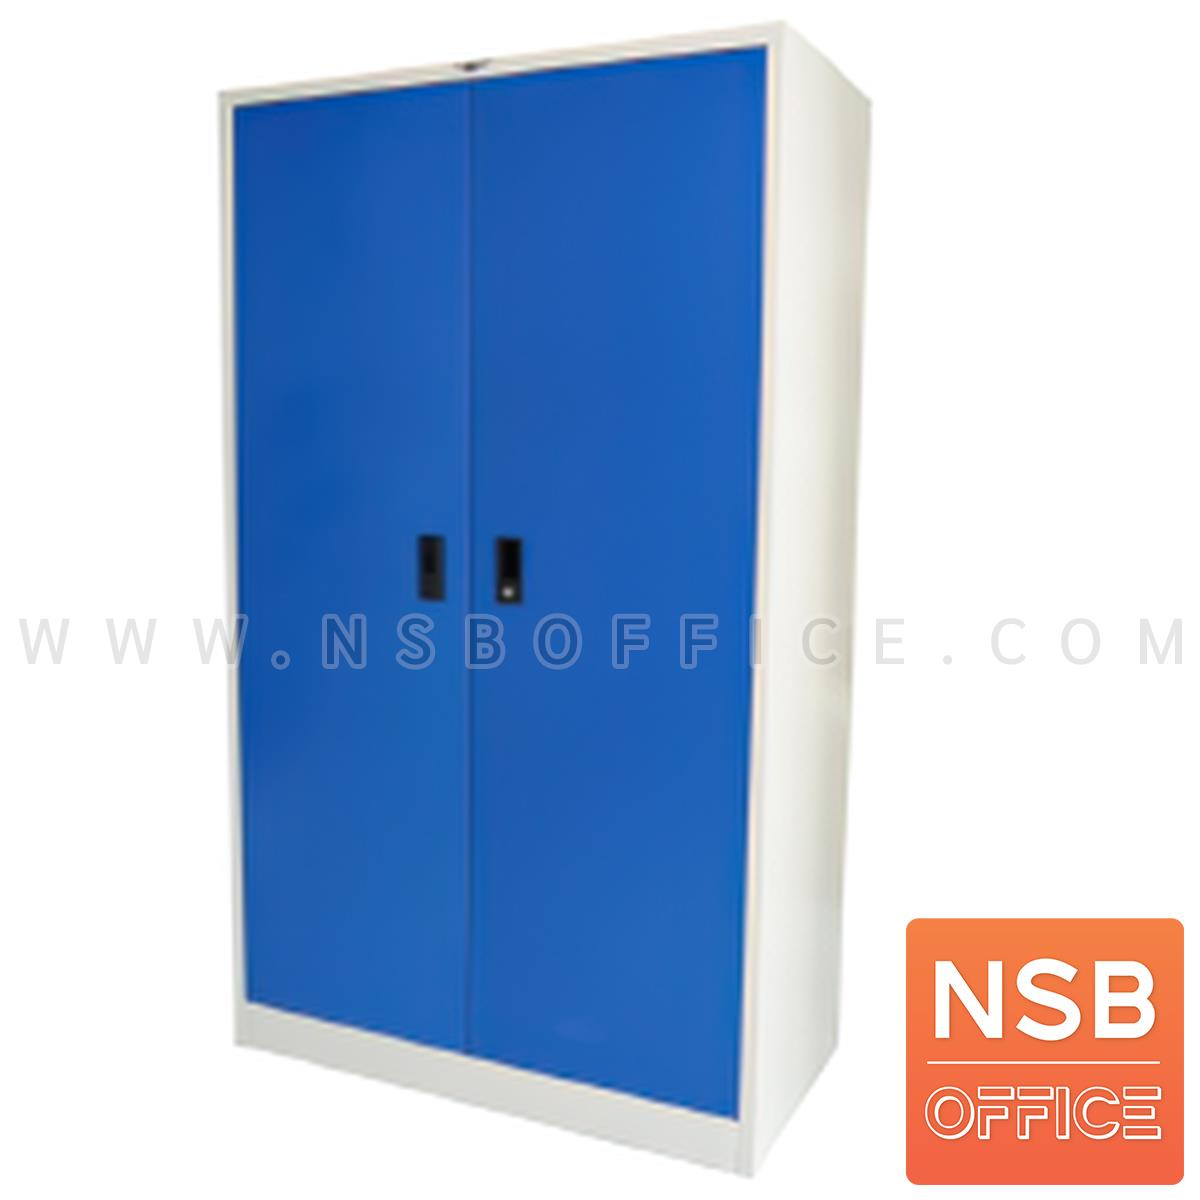 E07A098:ตู้เหล็ก 2 บานเปิด รุ่น Bluejay (บลูเจย์) ขนาด 3, 4 ฟุต (91.4W, 121.8W cm.) มือจับฝัง